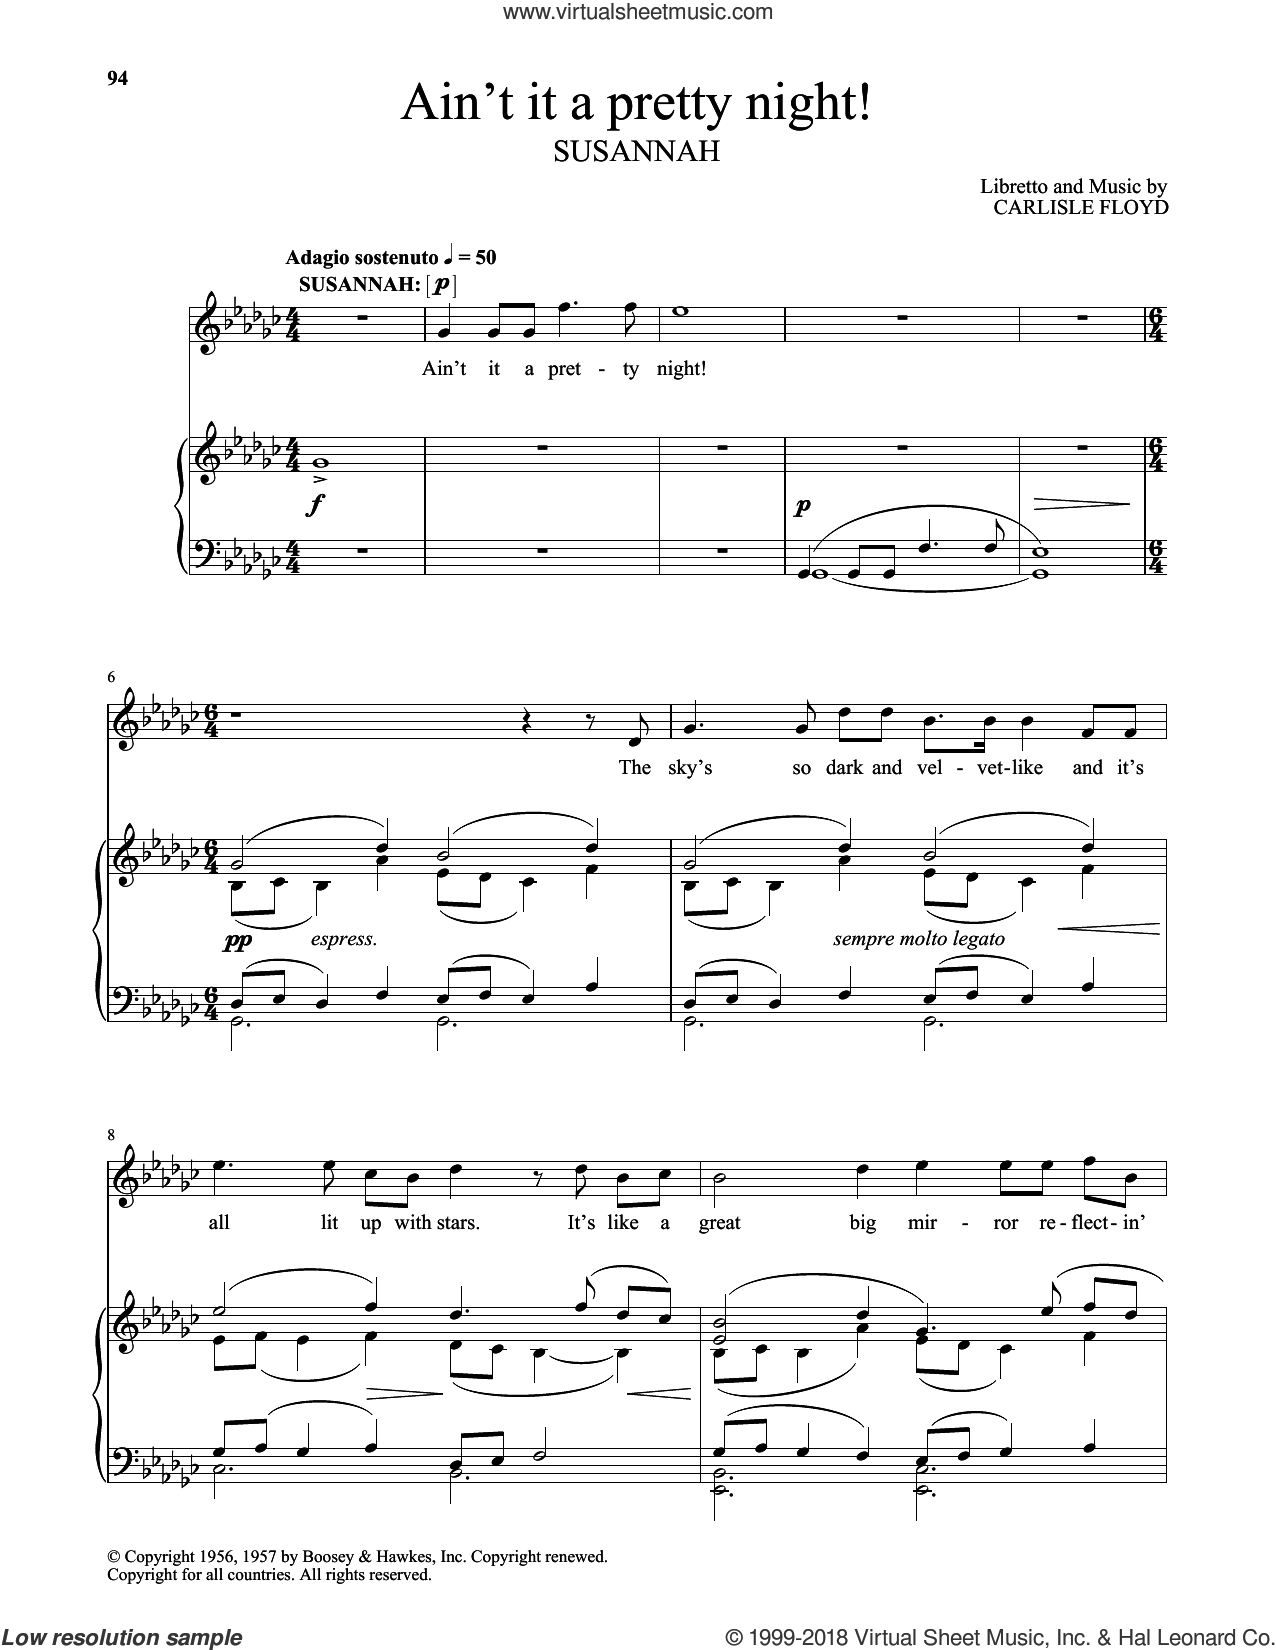 Ain't It A Pretty Night! sheet music for voice and piano (Soprano) by Carlisle Floyd, classical score, intermediate skill level